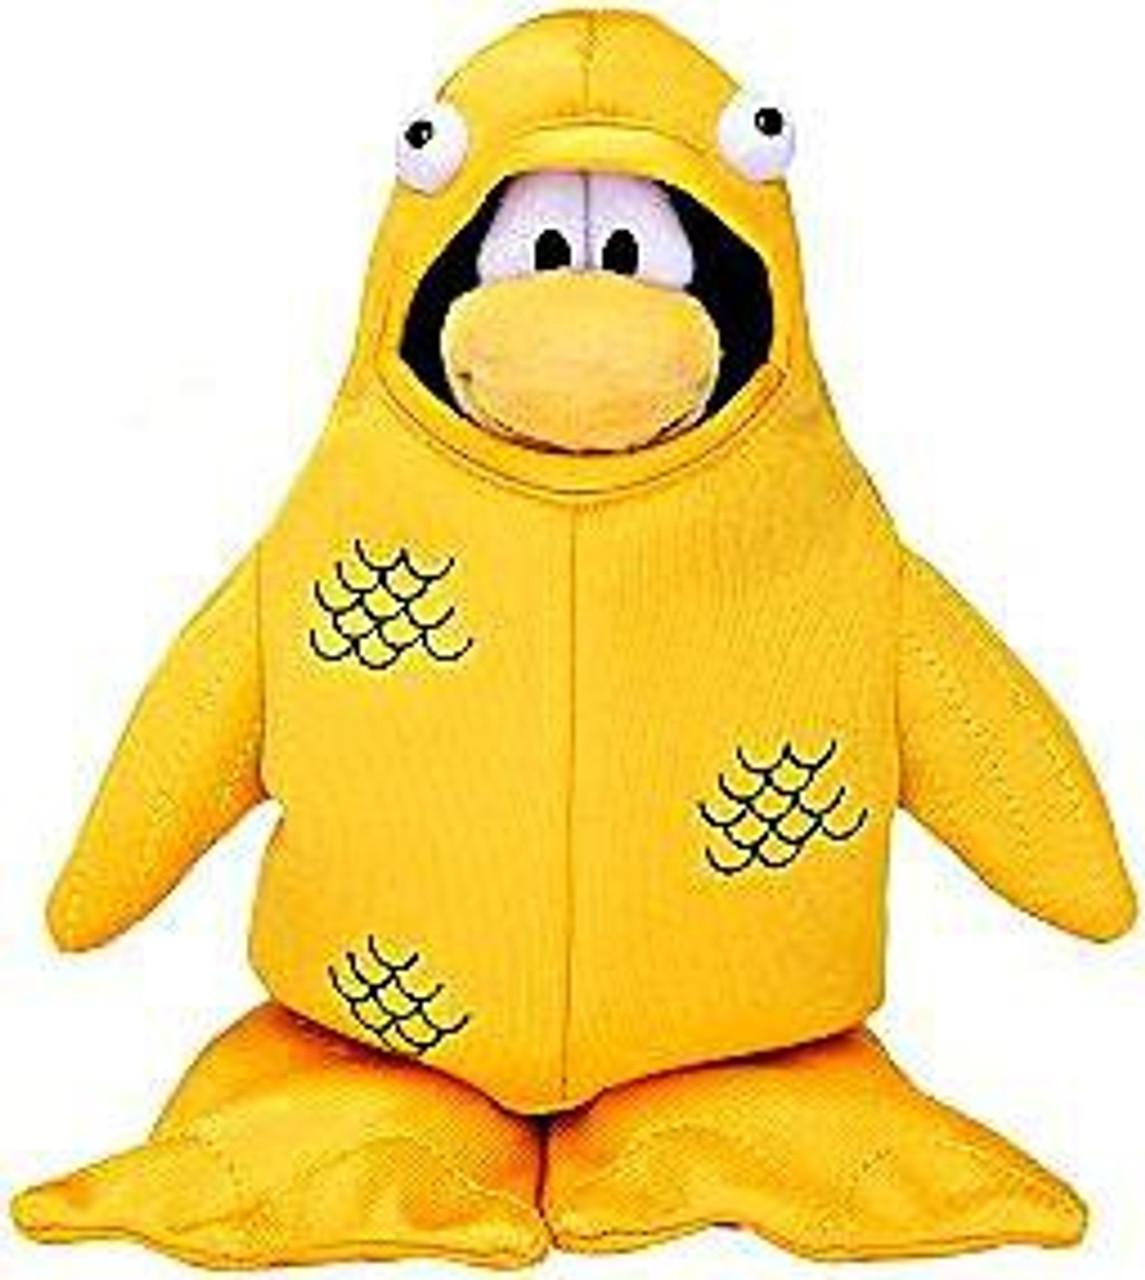 Club Penguin Series 4 12th Fish Costume 6.5-Inch Plush Figure